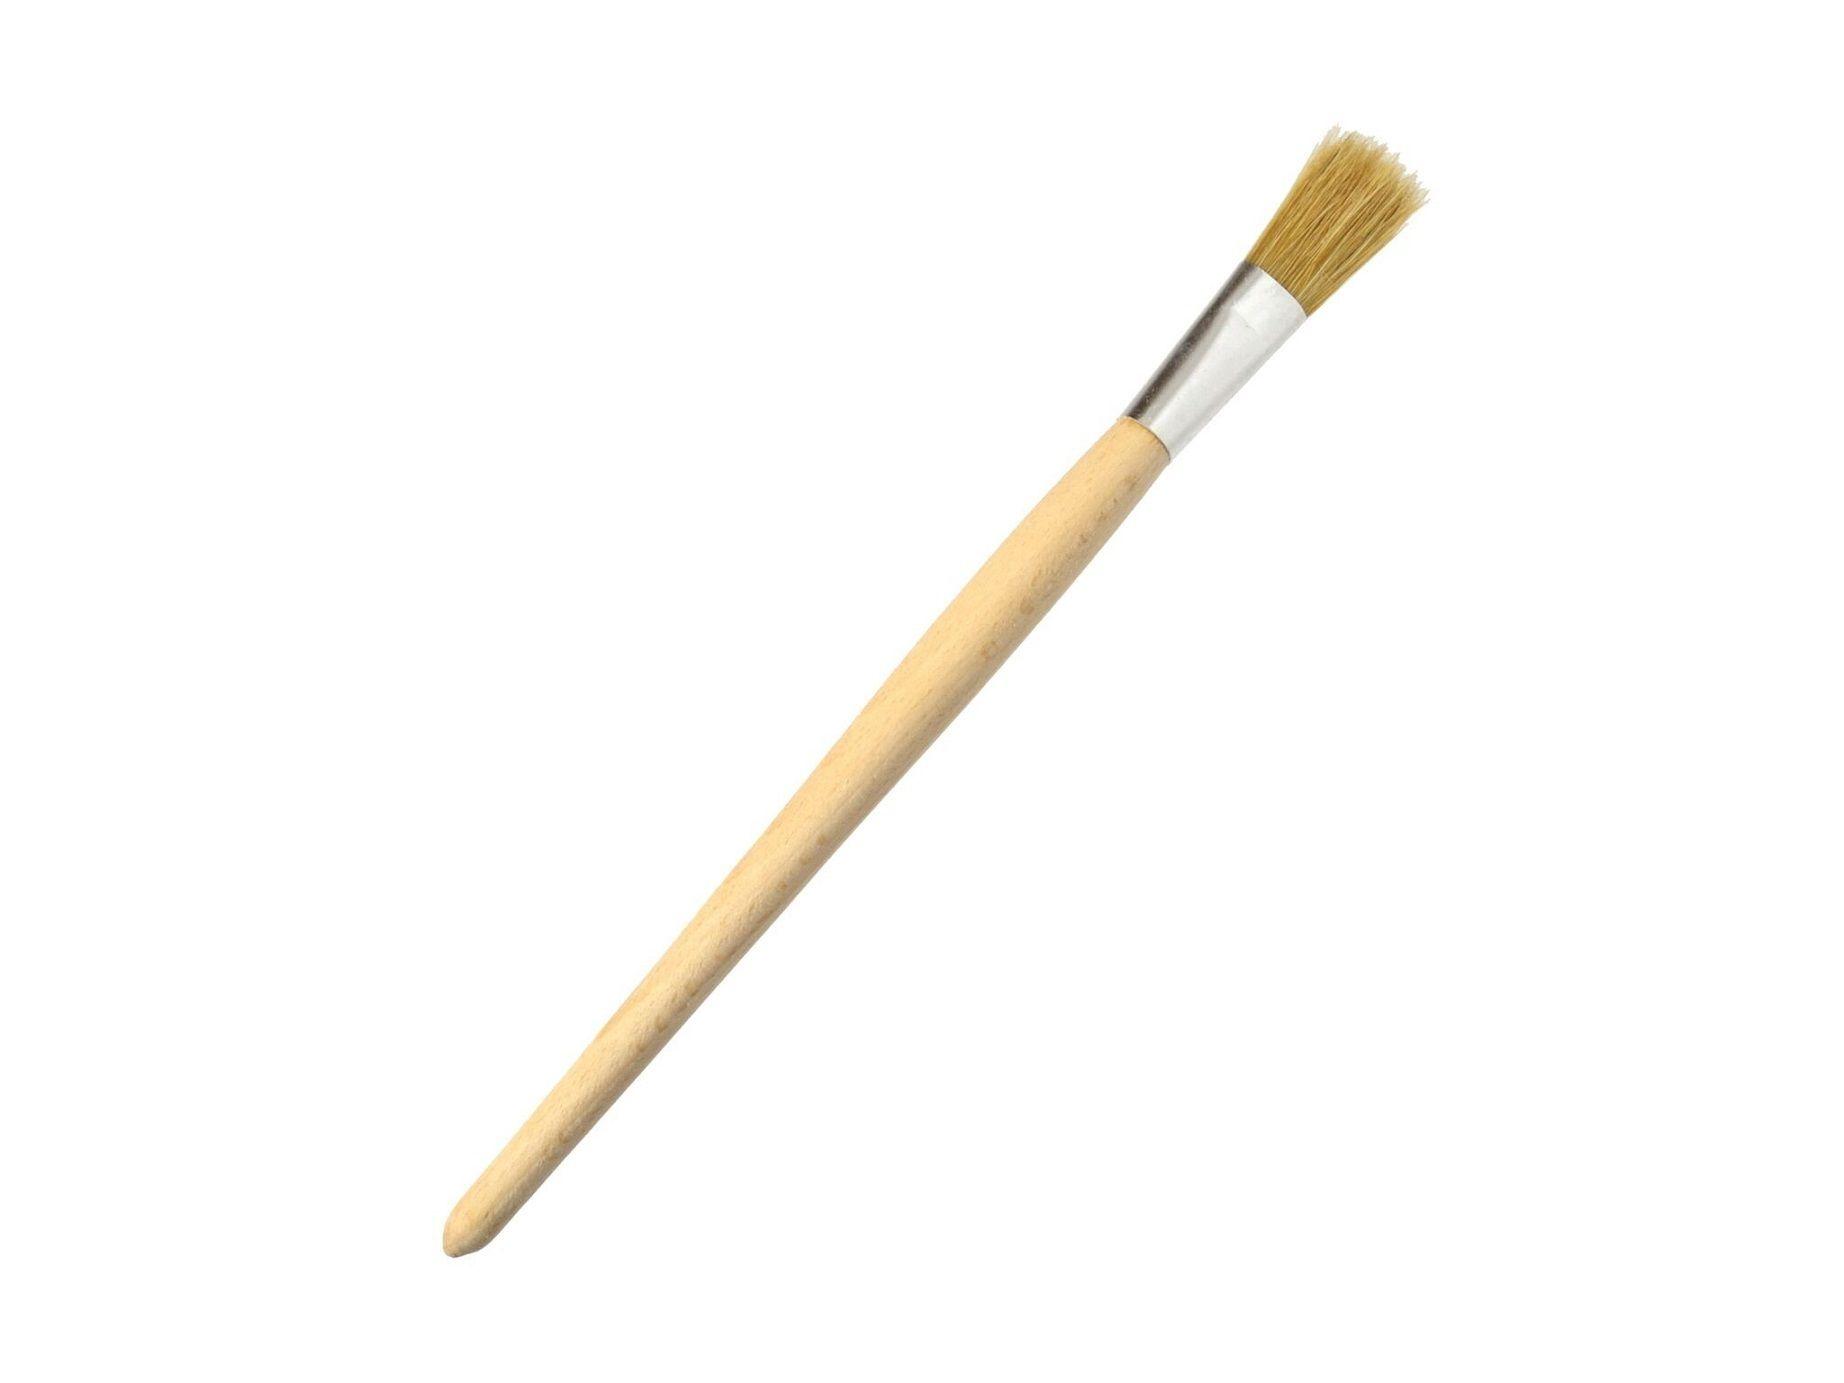 Štetec kulatý, 12 mm, dřevěná rukojeť, GEKO